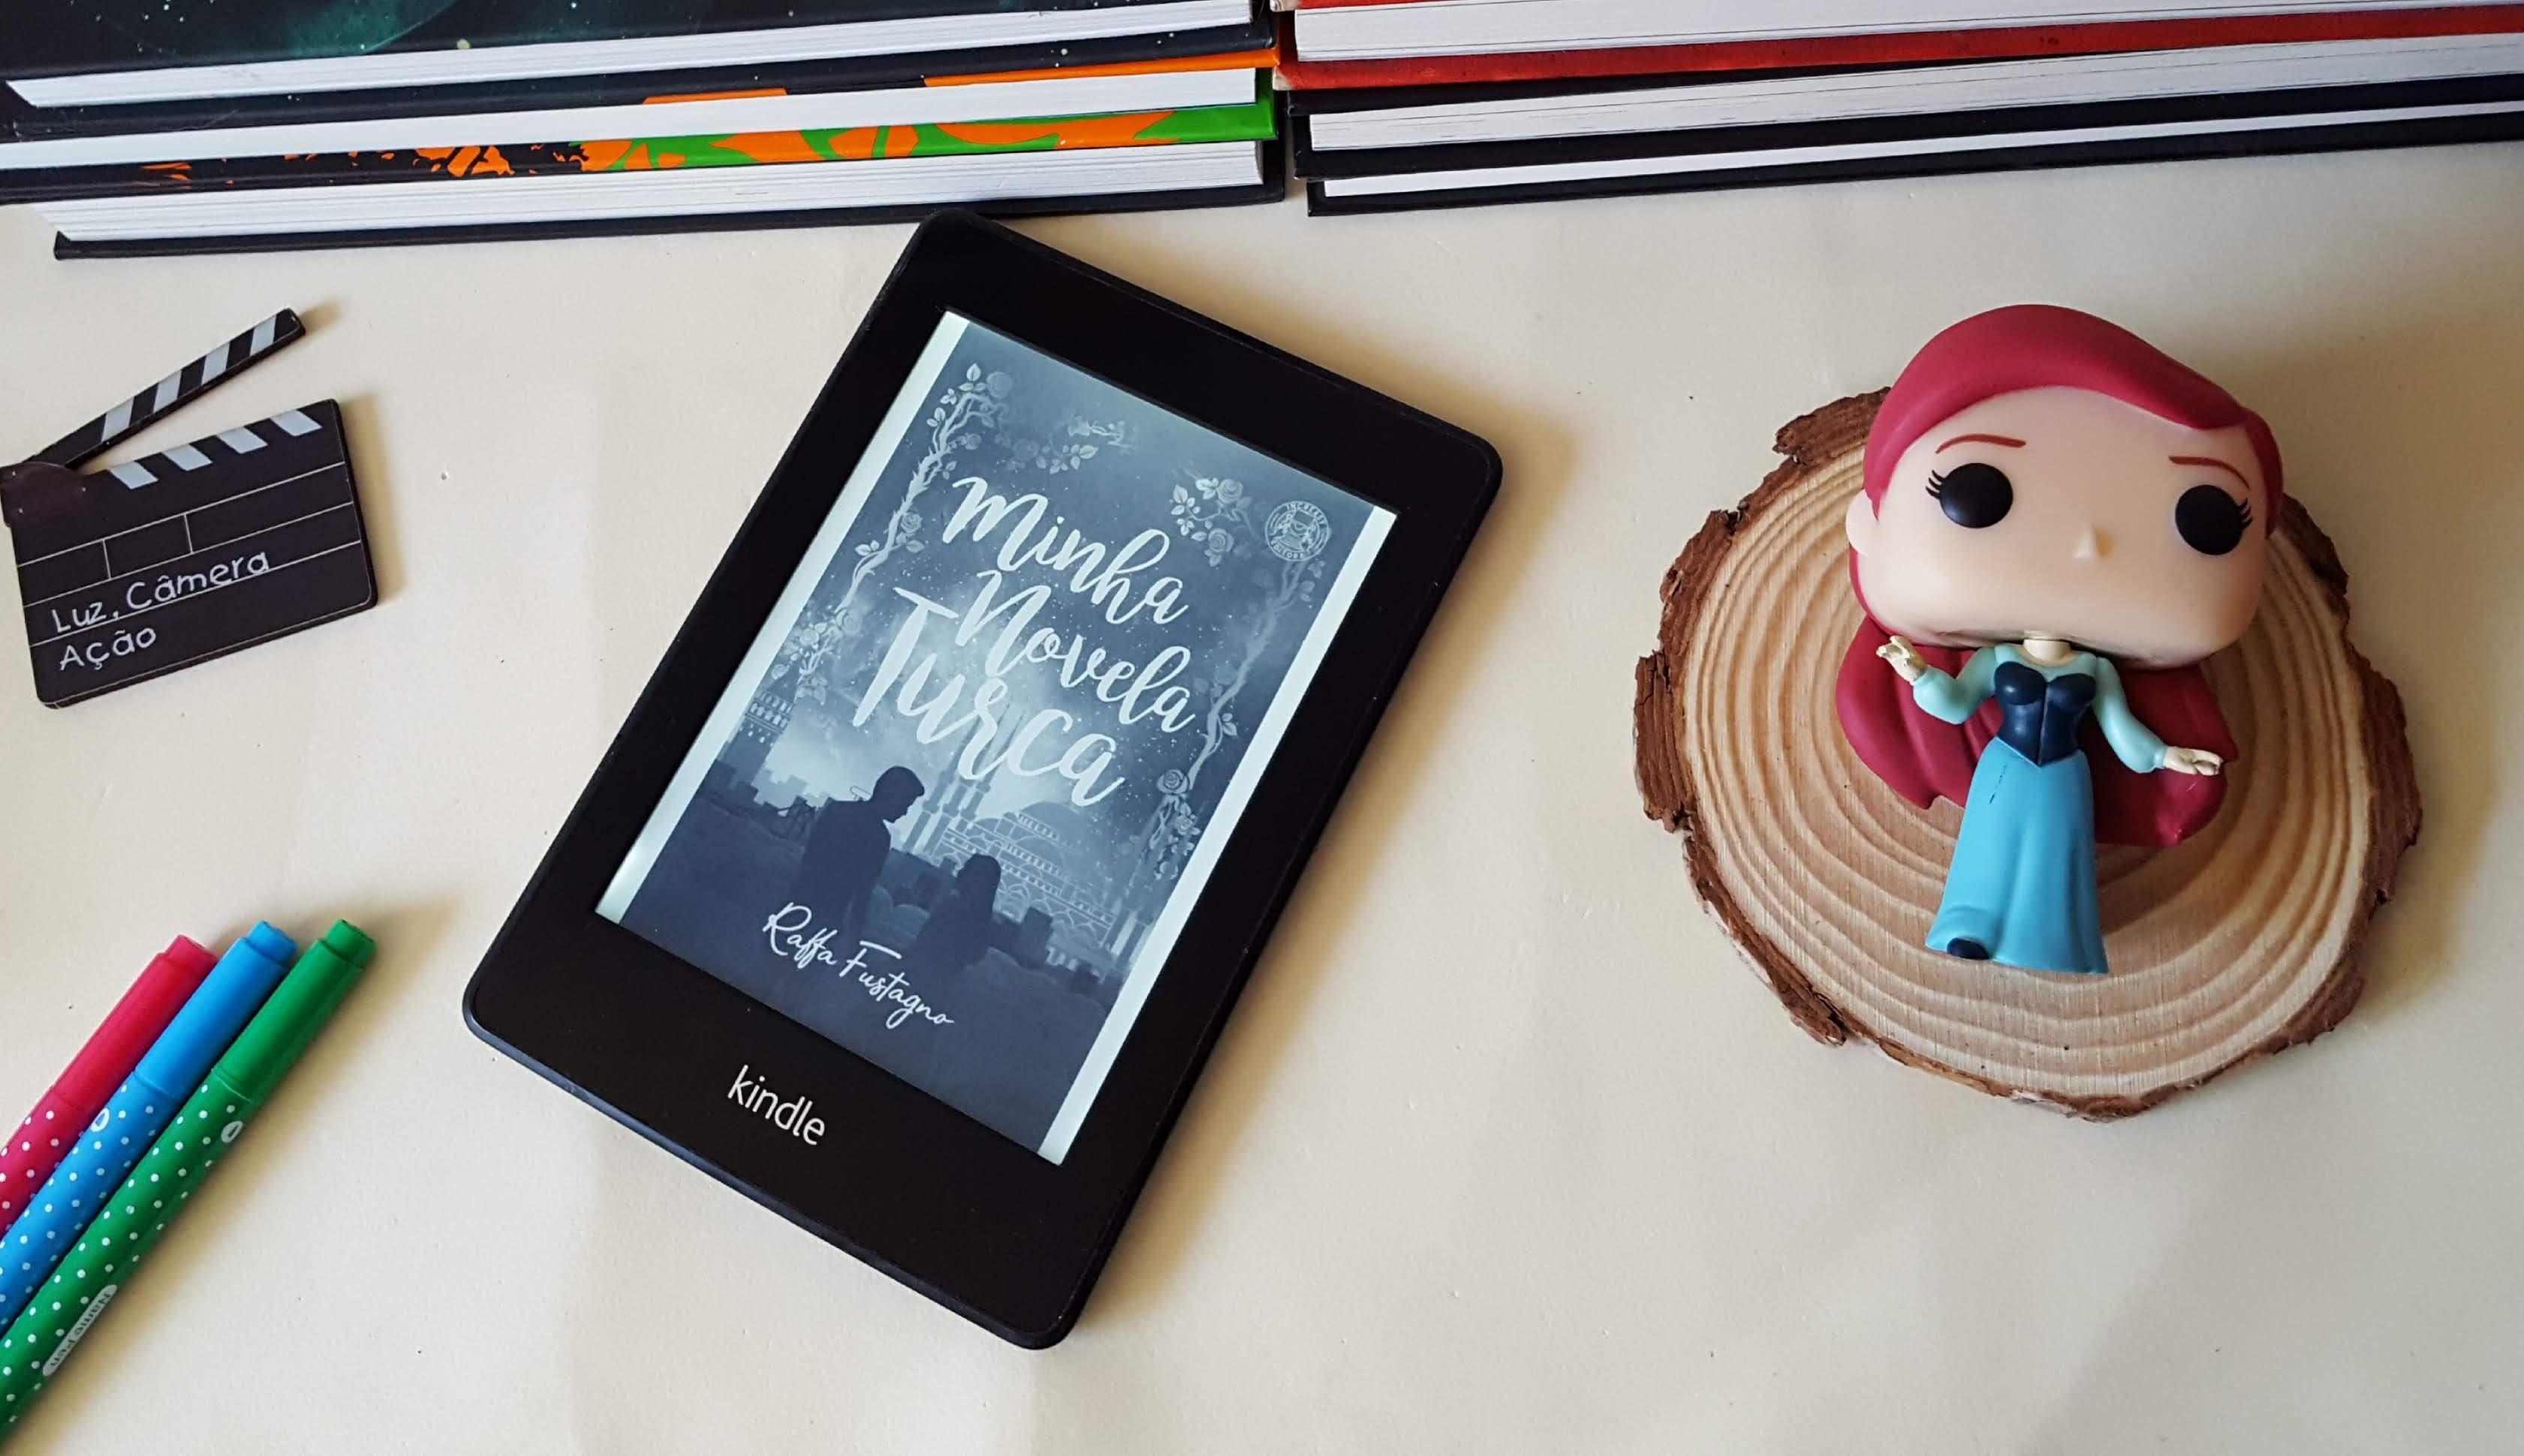 Minha novela turca | Raffa Fustagno